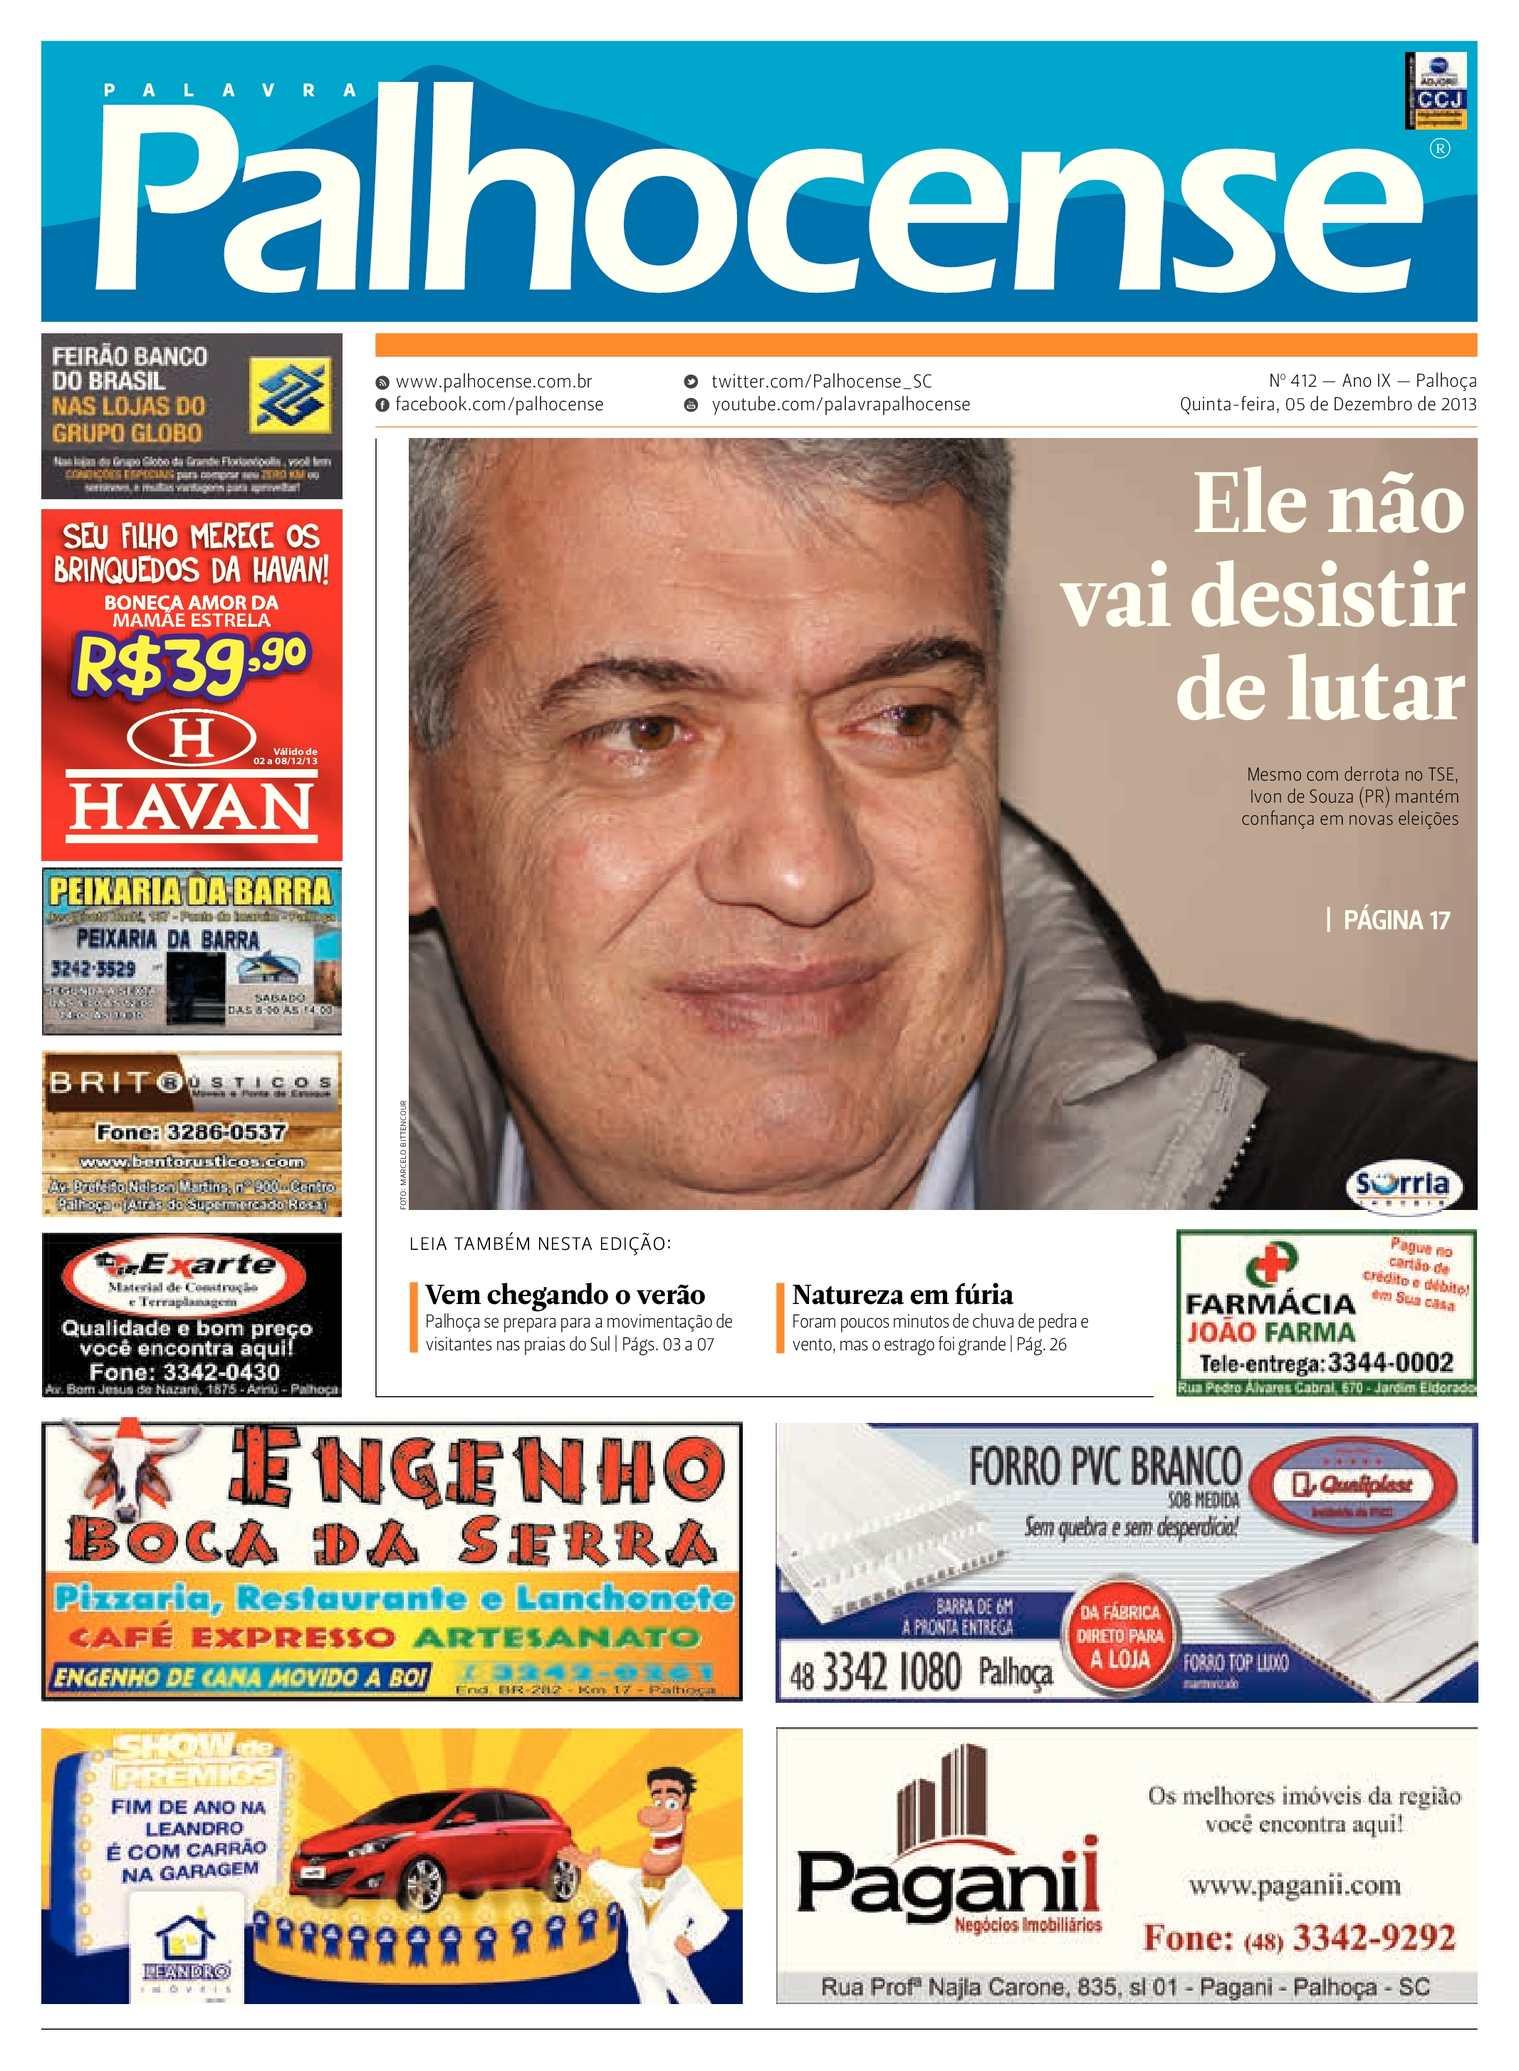 2fdccd65be Calaméo - Jornal Palavra Palhocense - Edição 412